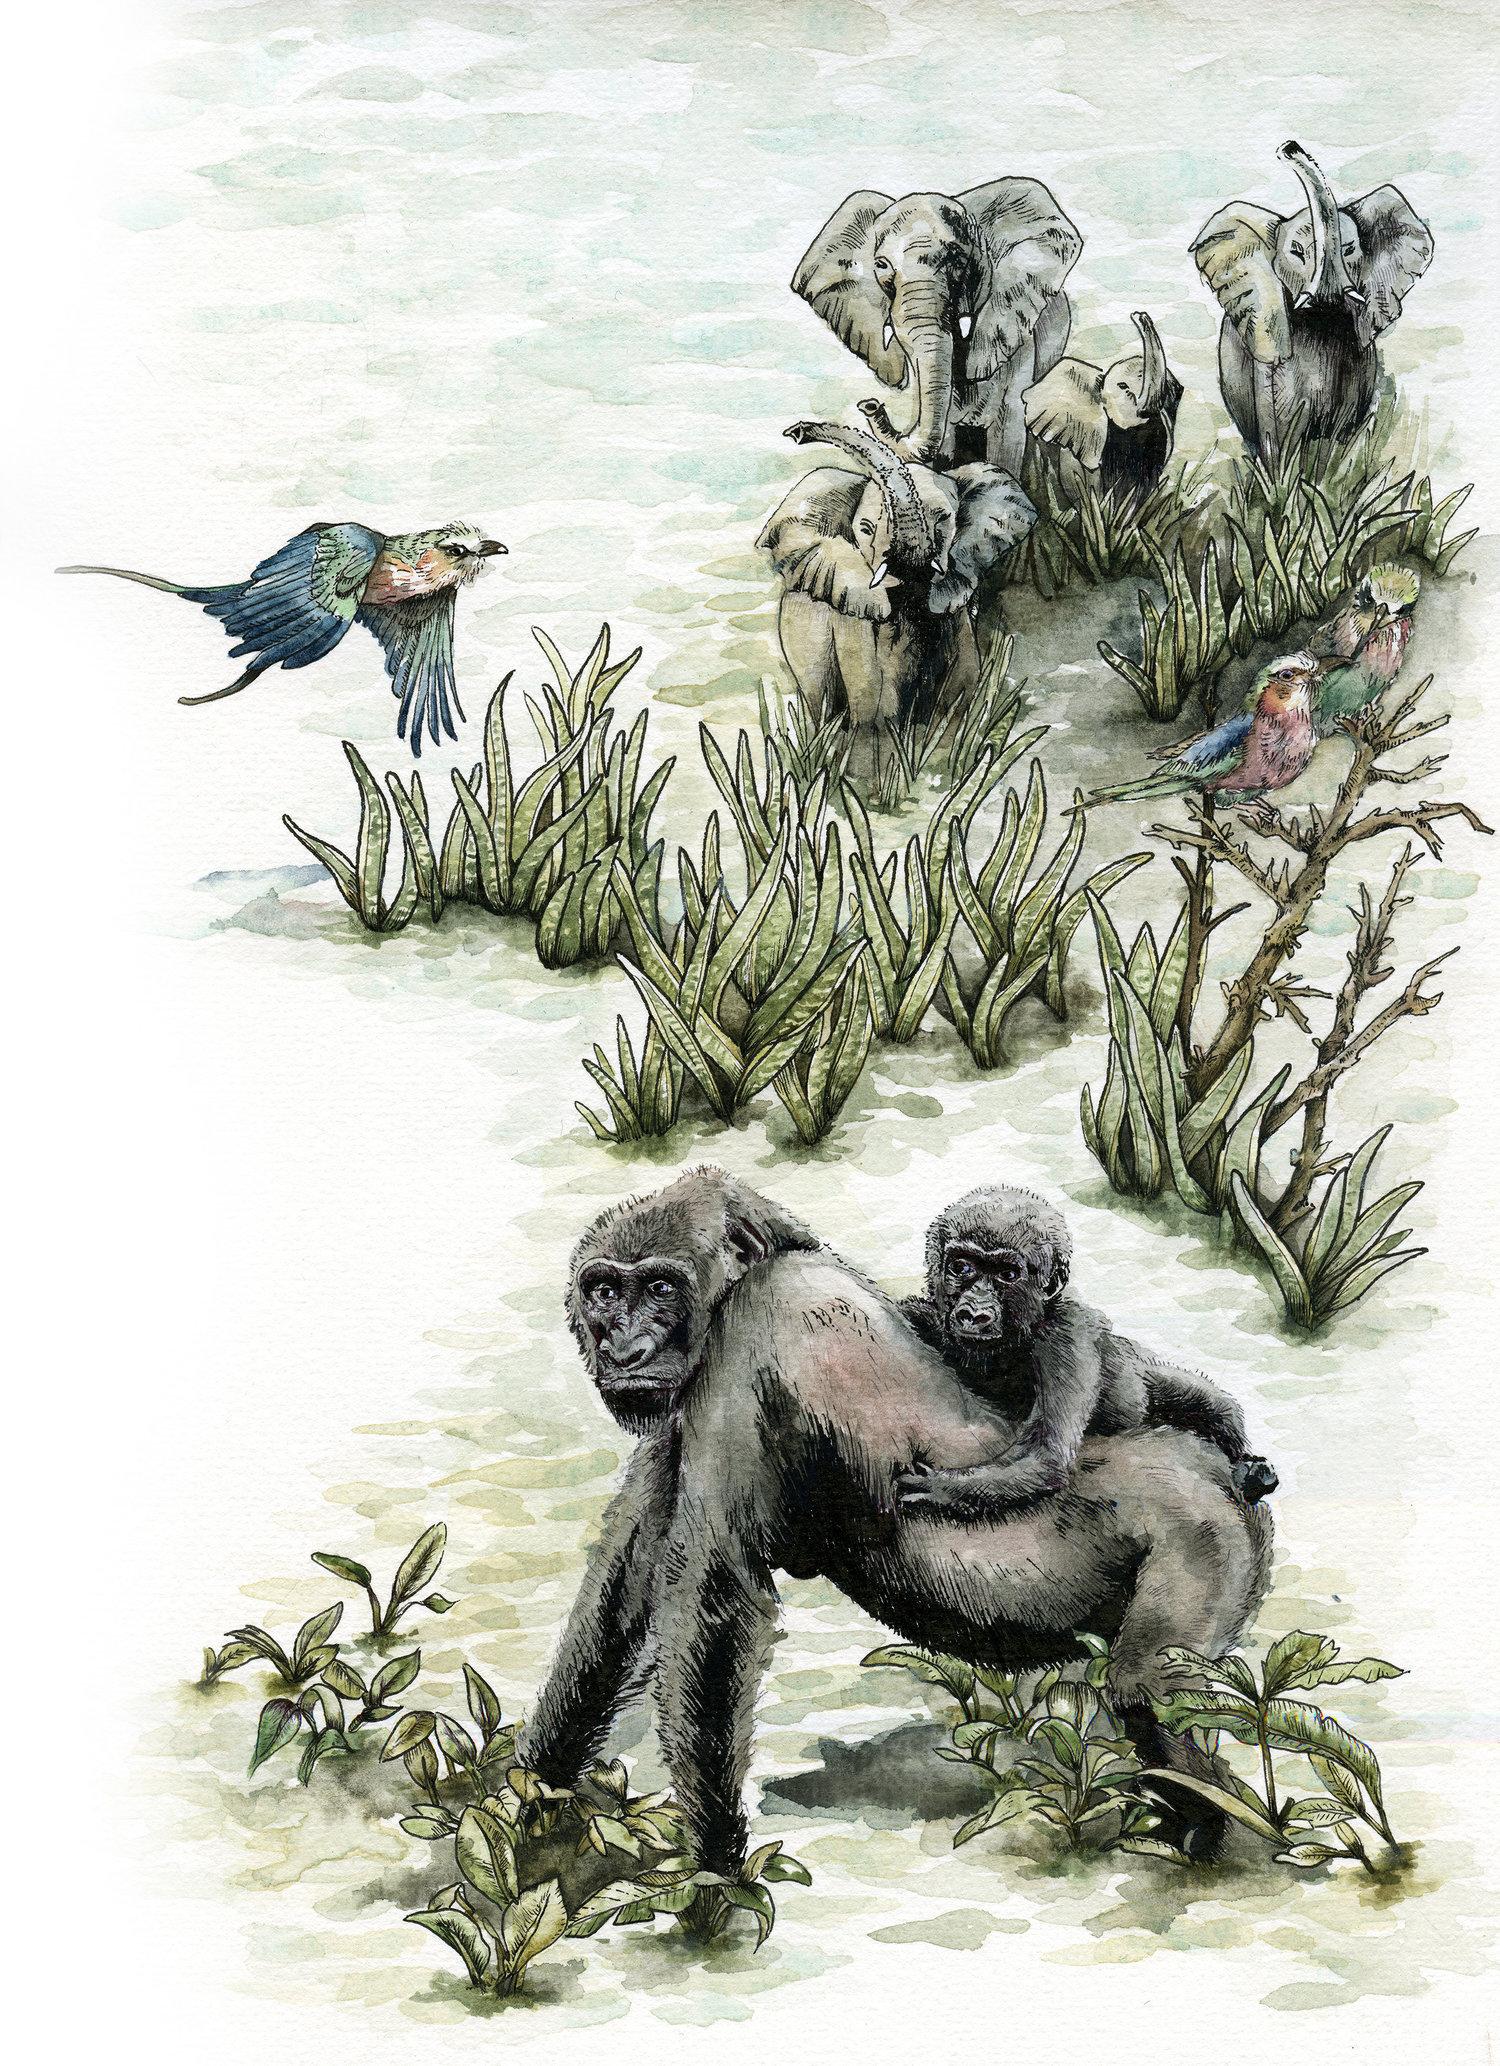 Walking through Congo River, Watercolour & Ink on Paper, 24 x 30 cm, 2017.